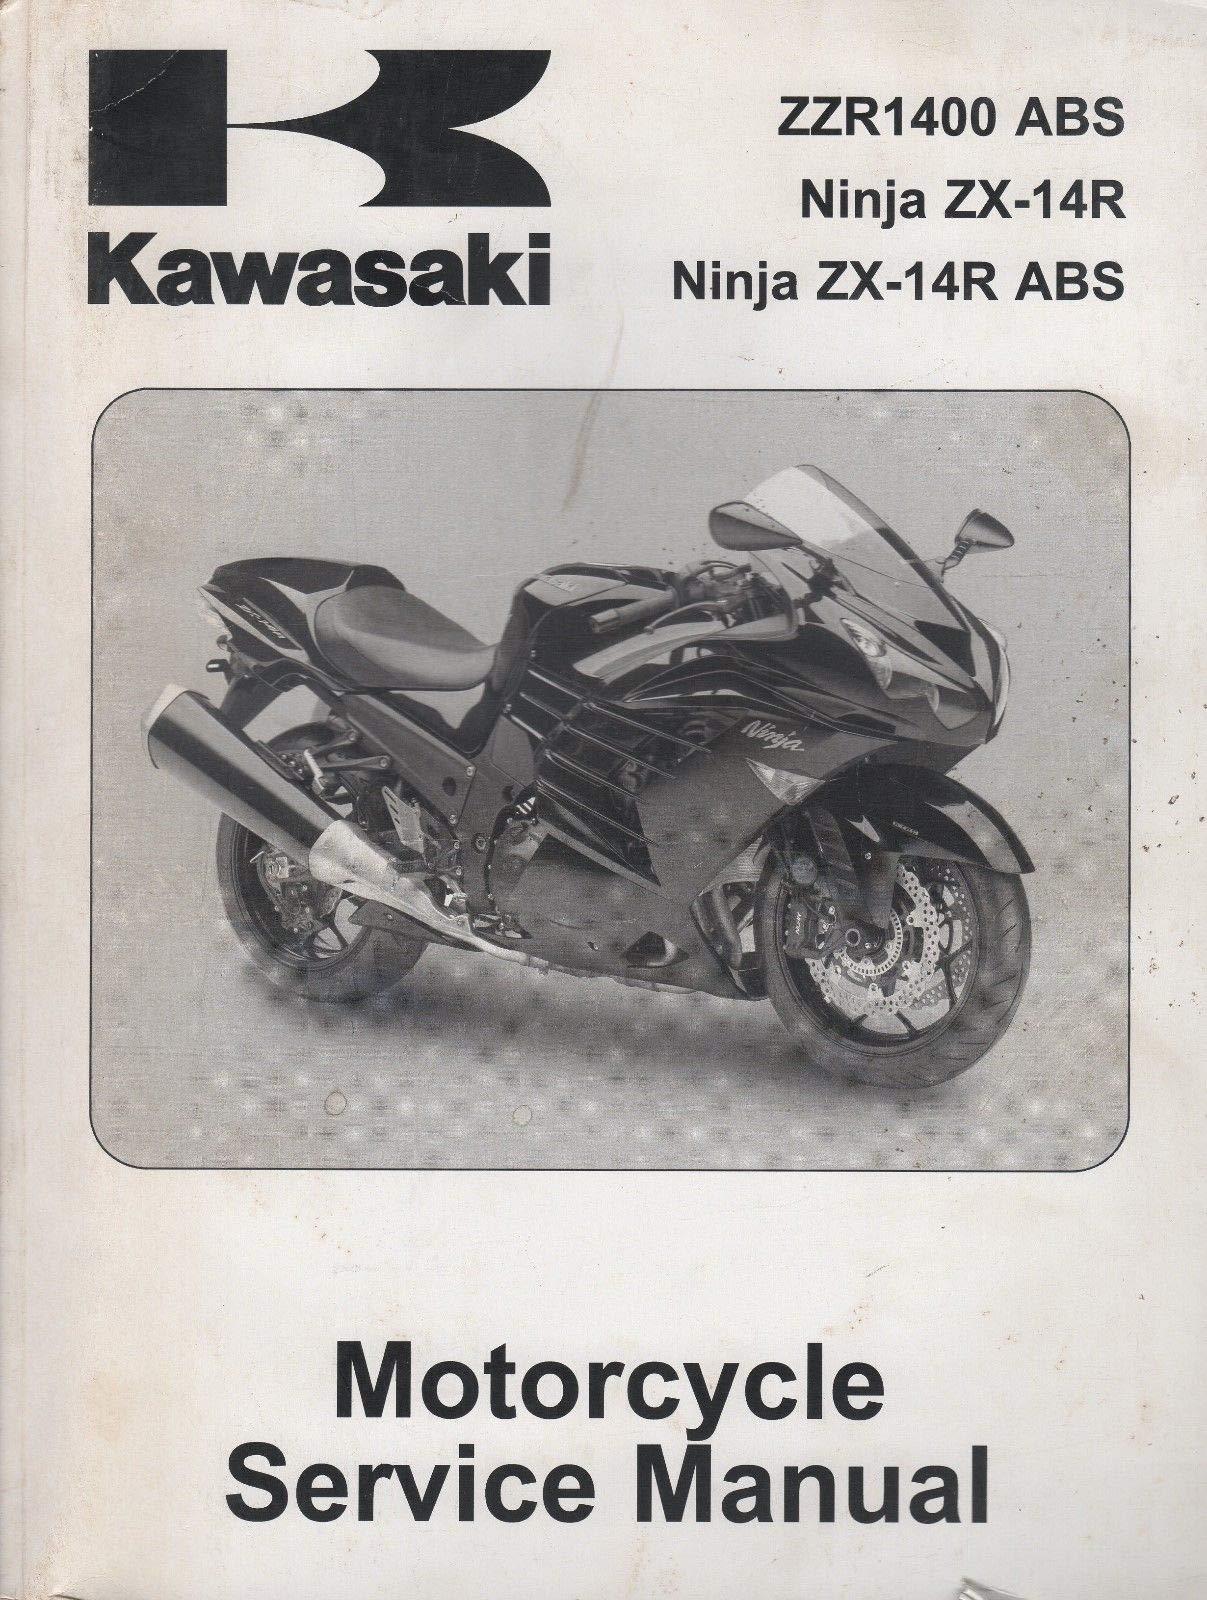 2012 KAWASAKI MOTORCYCLE NINJA ZX-14R ABS SERVICE MANUAL P/N ...